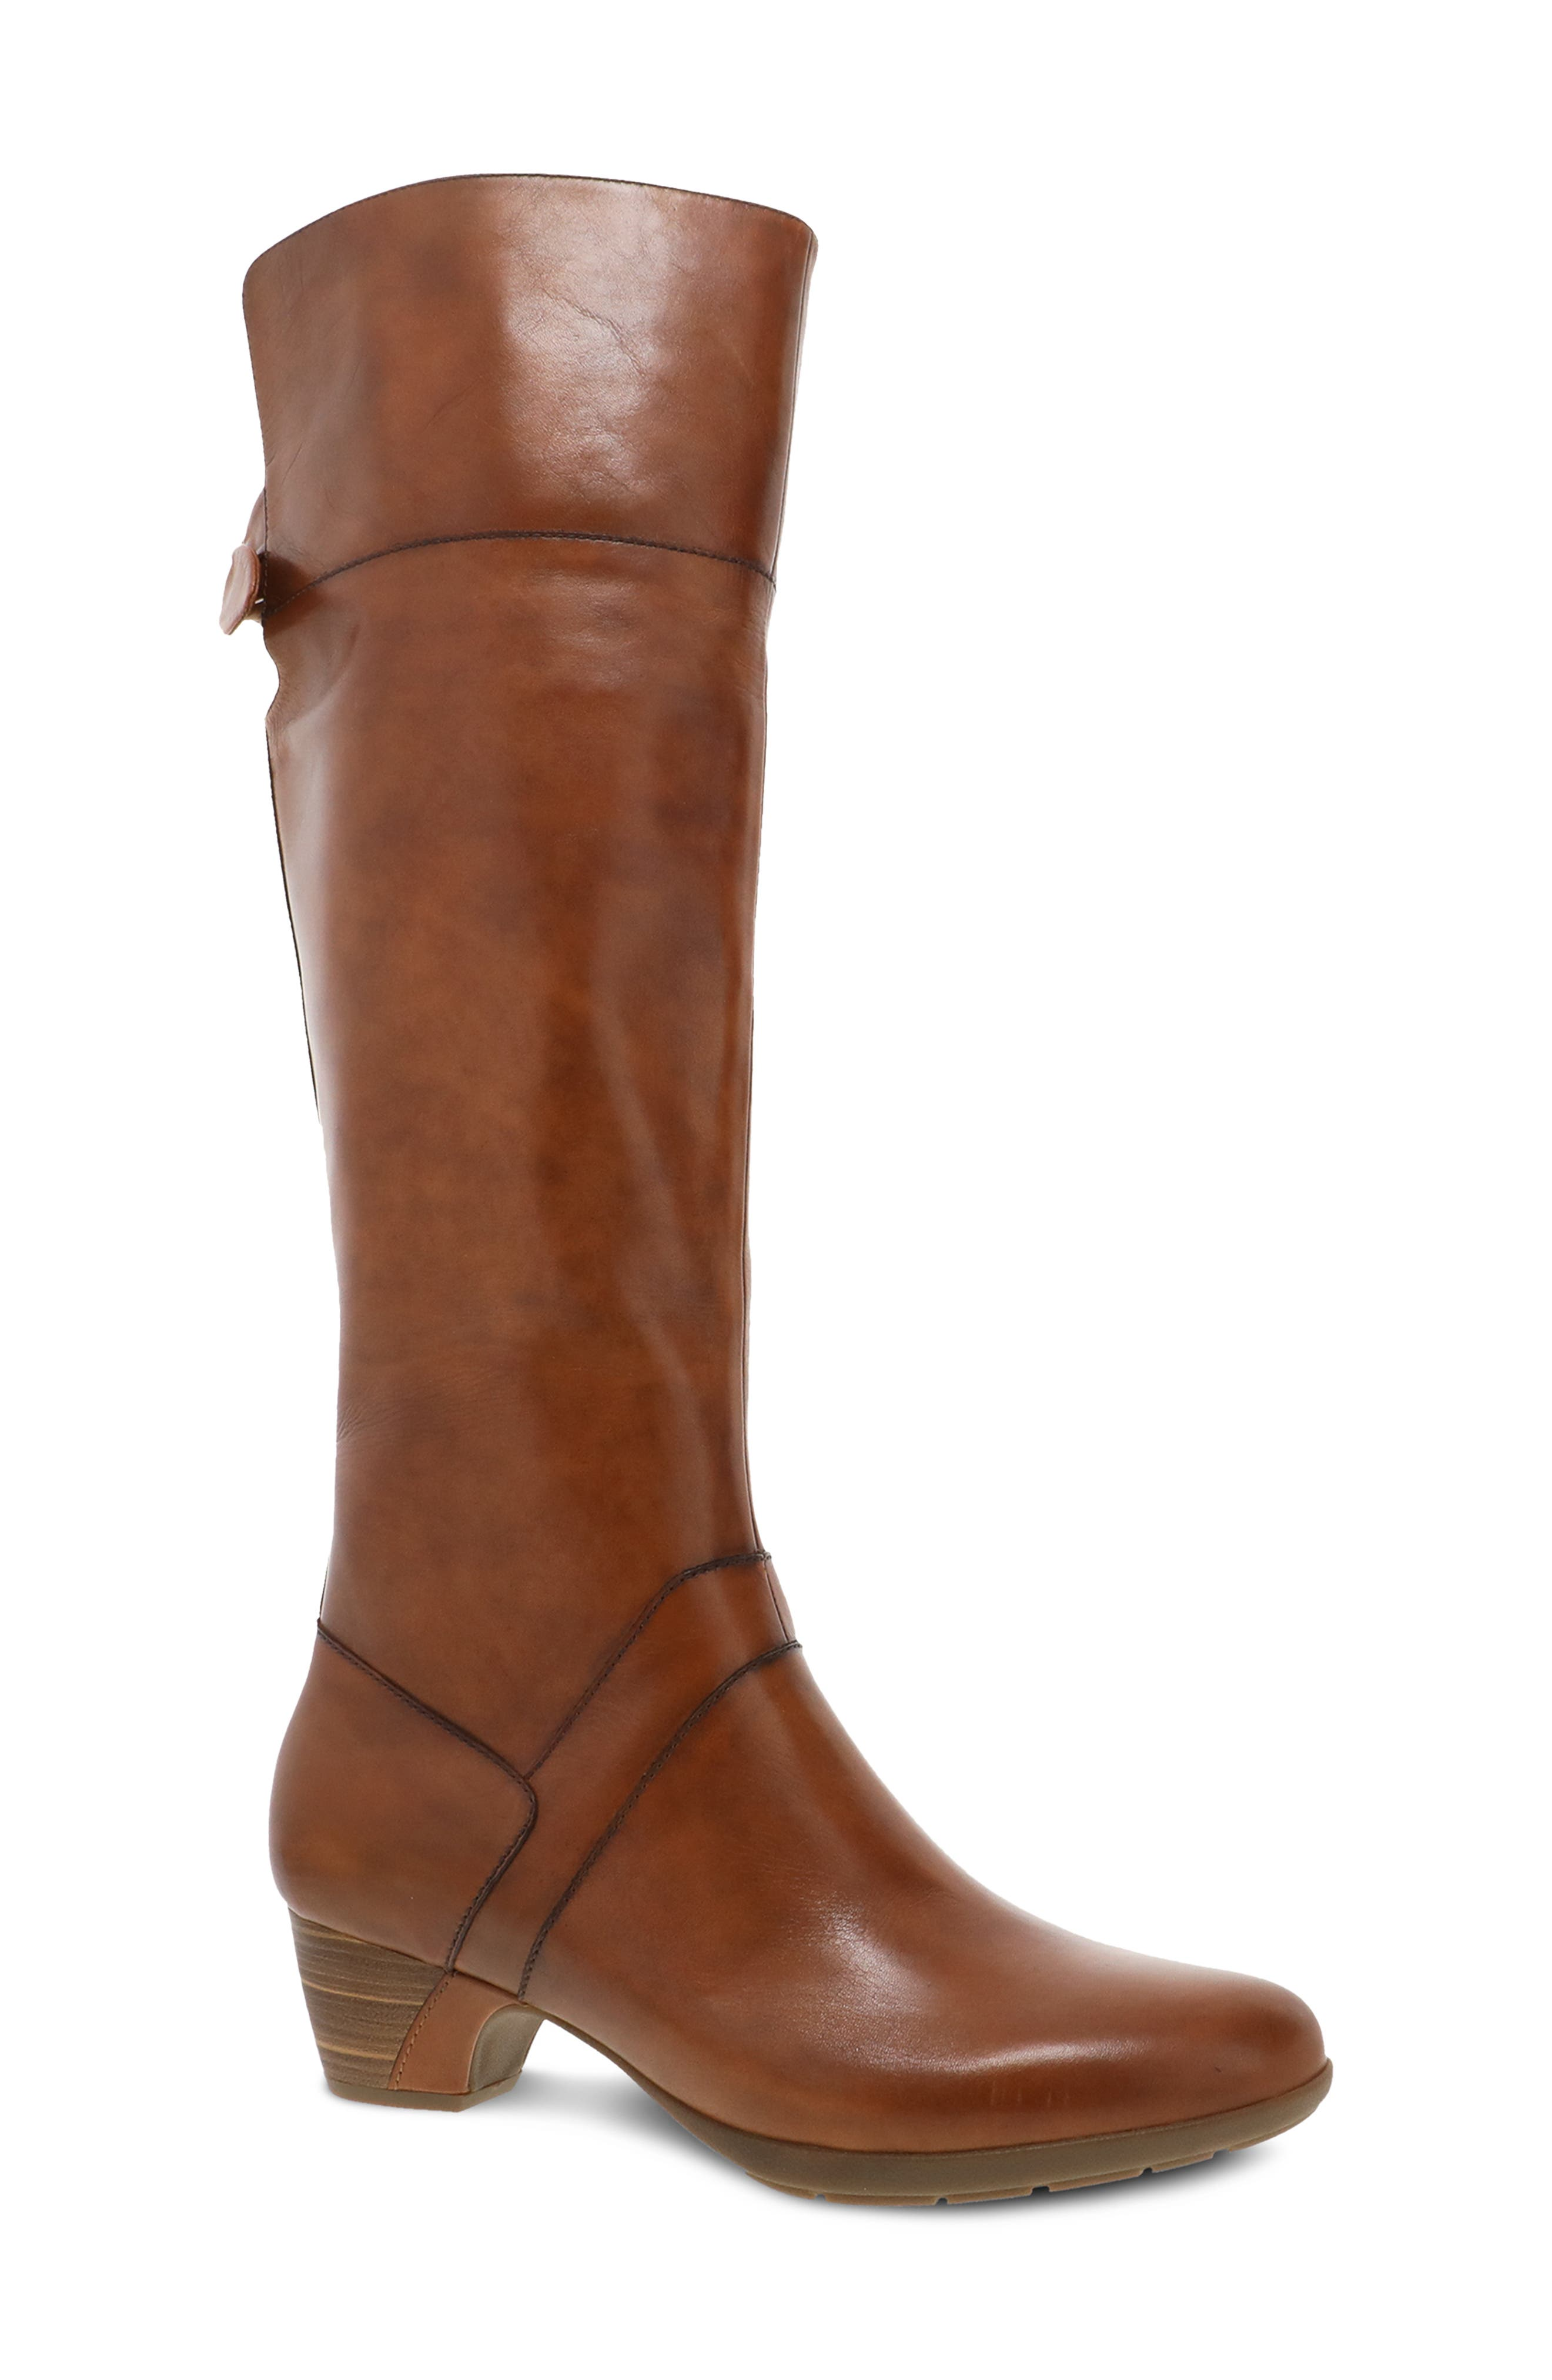 Dori Waterproof Knee High Boot